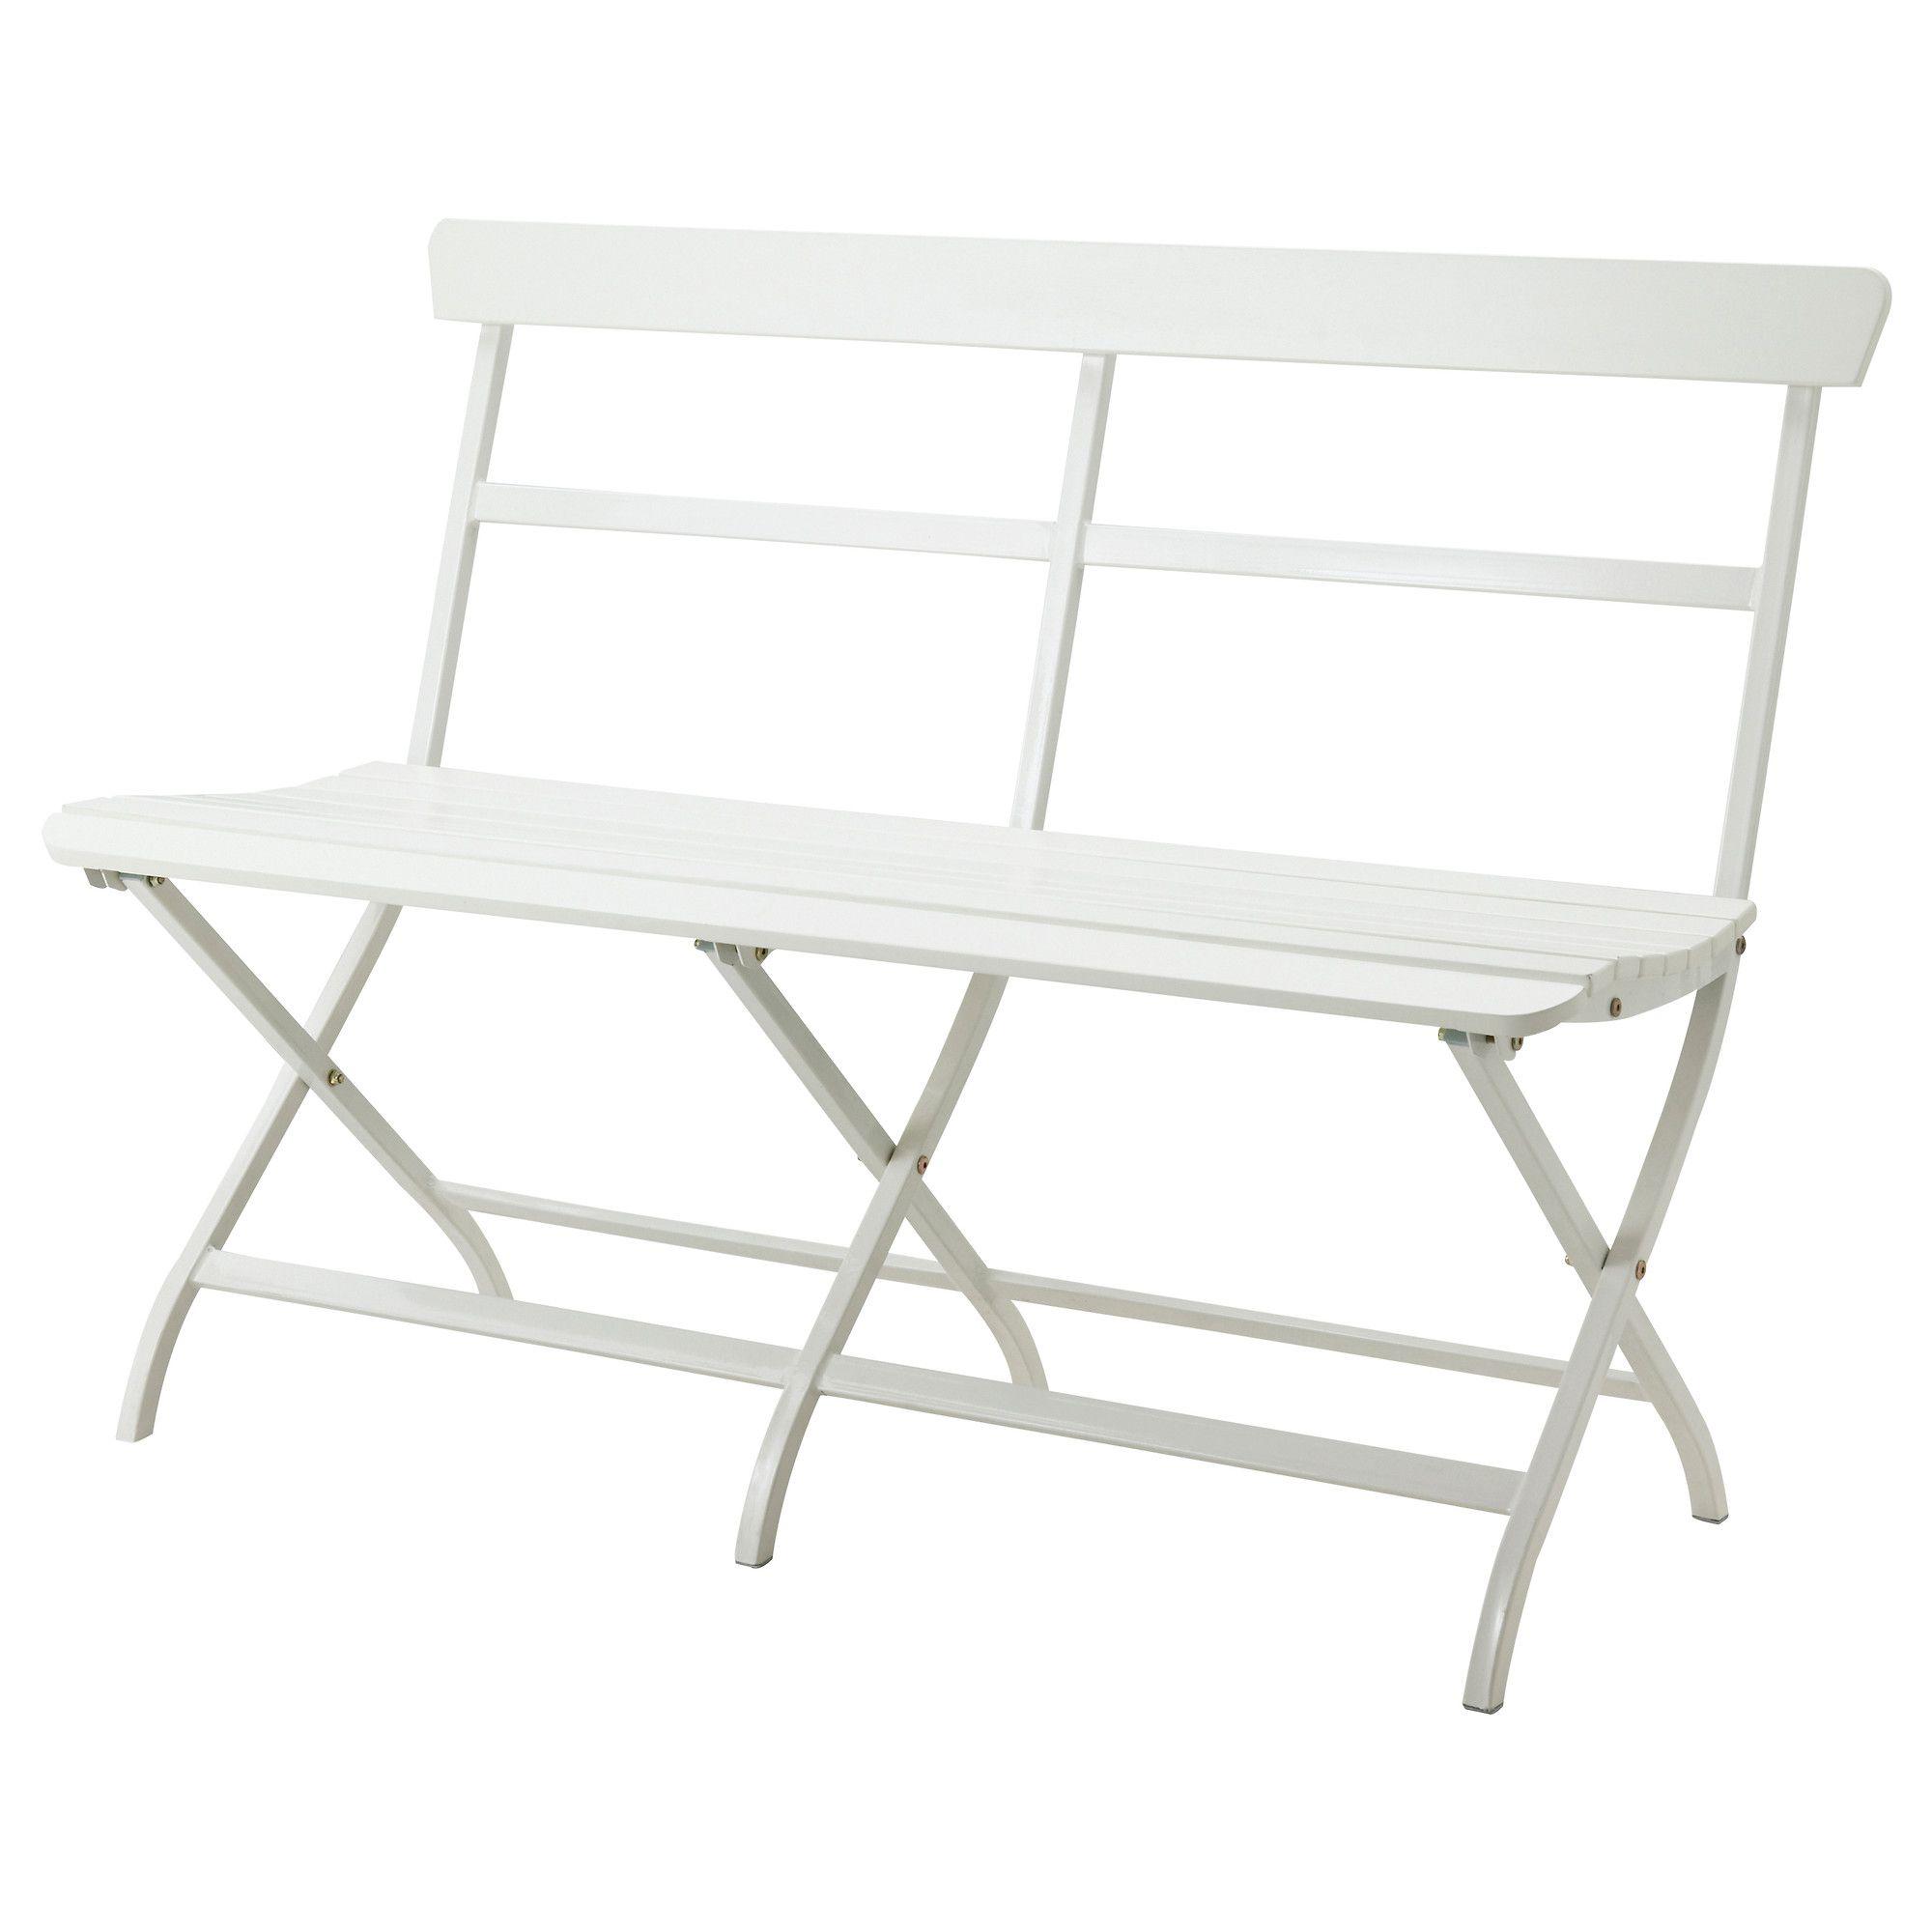 Us Furniture And Home Furnishings Havemobler Ikea Havemobler